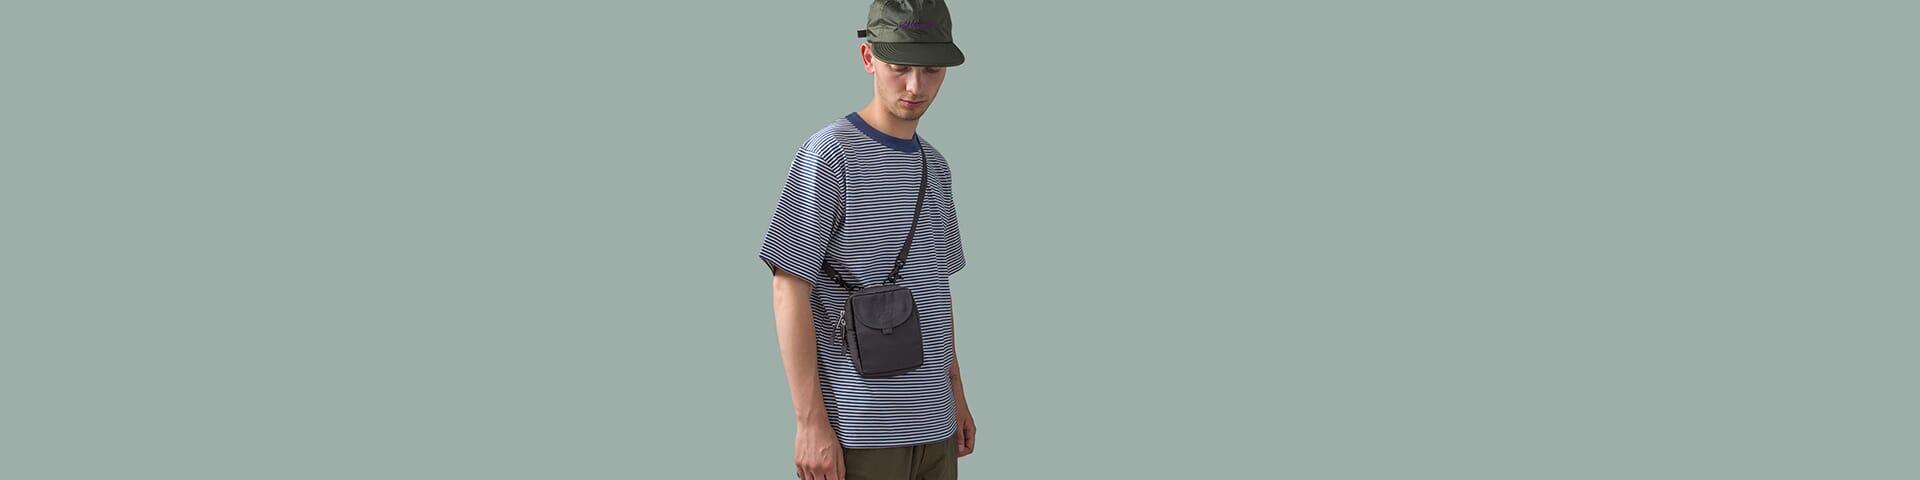 Peggs & son | Premium international menswear